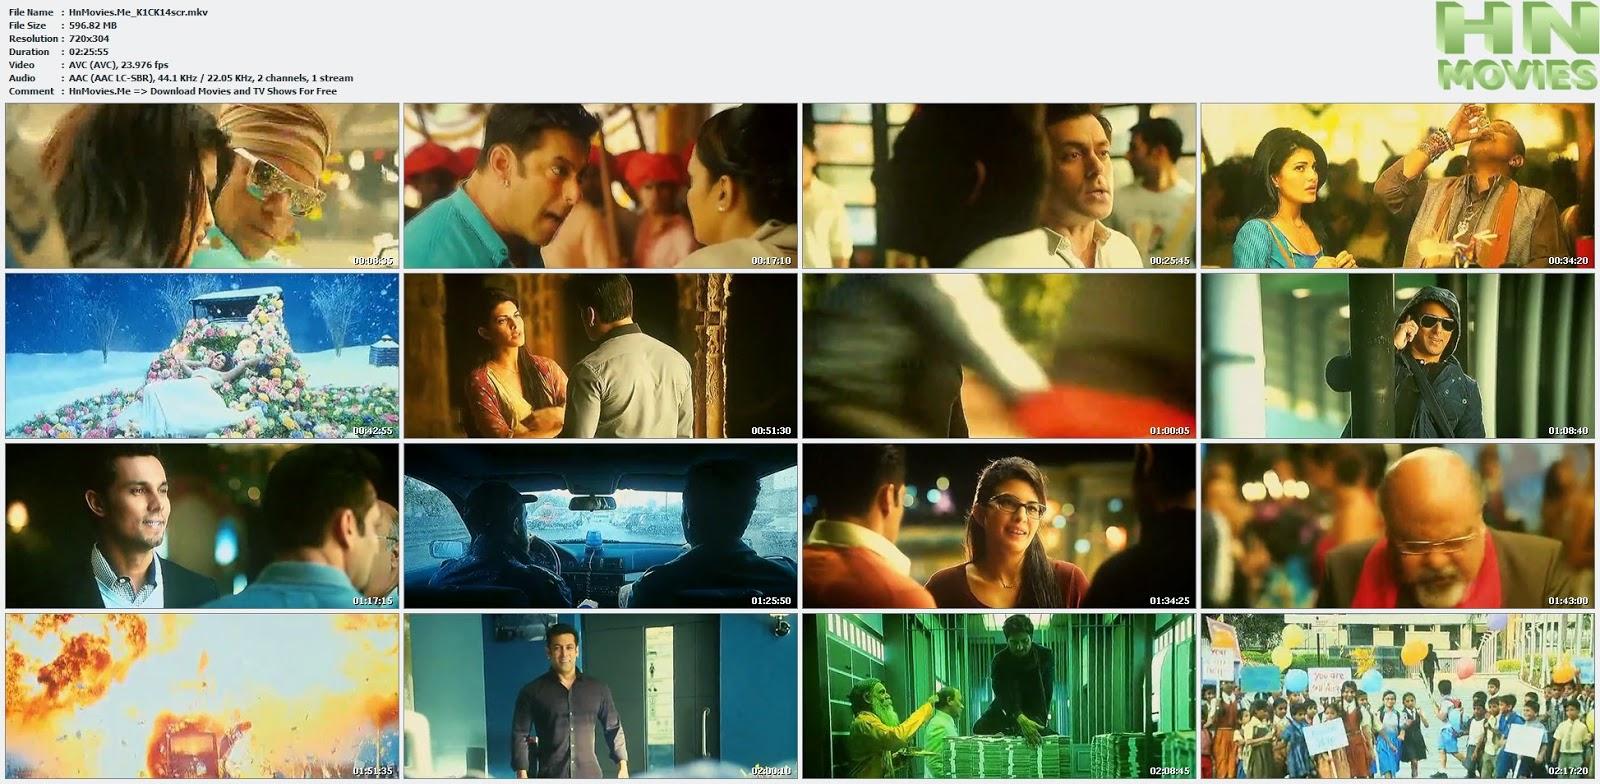 movie screenshot kick 2014 fdmovie.com